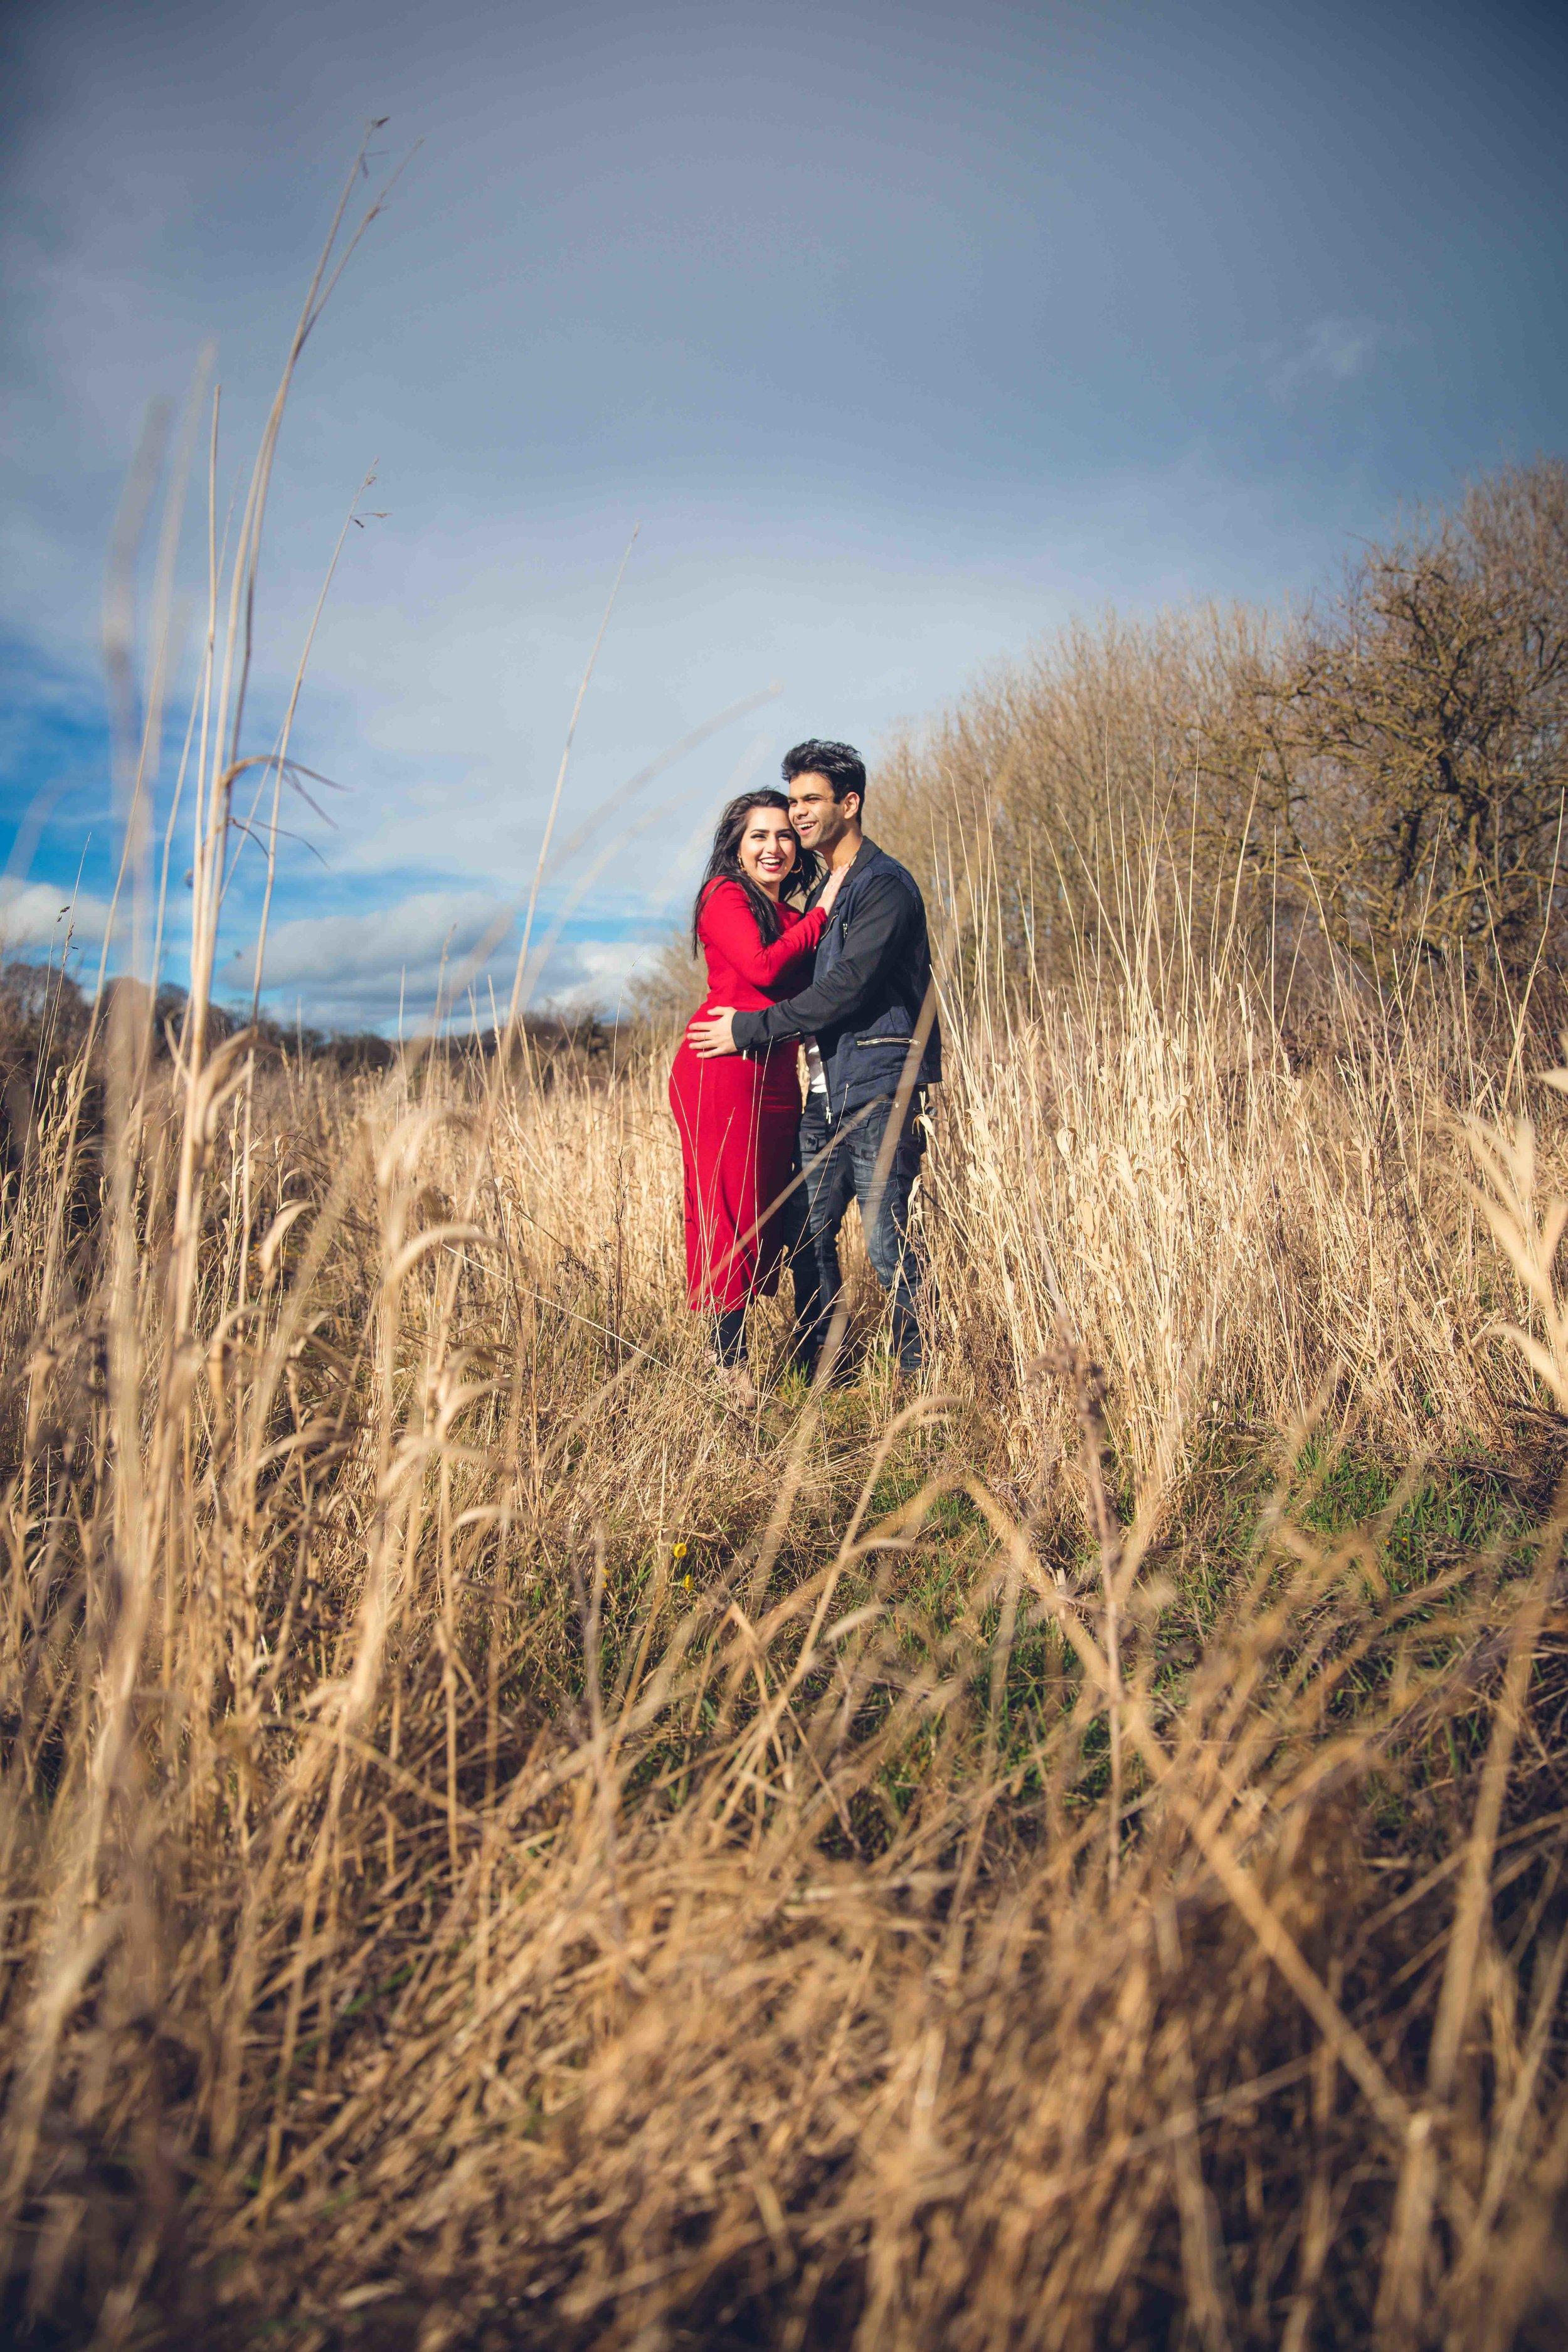 Asian Wedding Photographer Opu Sultan Photography Lyme Park Scotland Edinburgh Glasgow London Manchester Liverpool Birmingham Wedding Photos prewed shoot Jams & Tams Blog-6.jpg